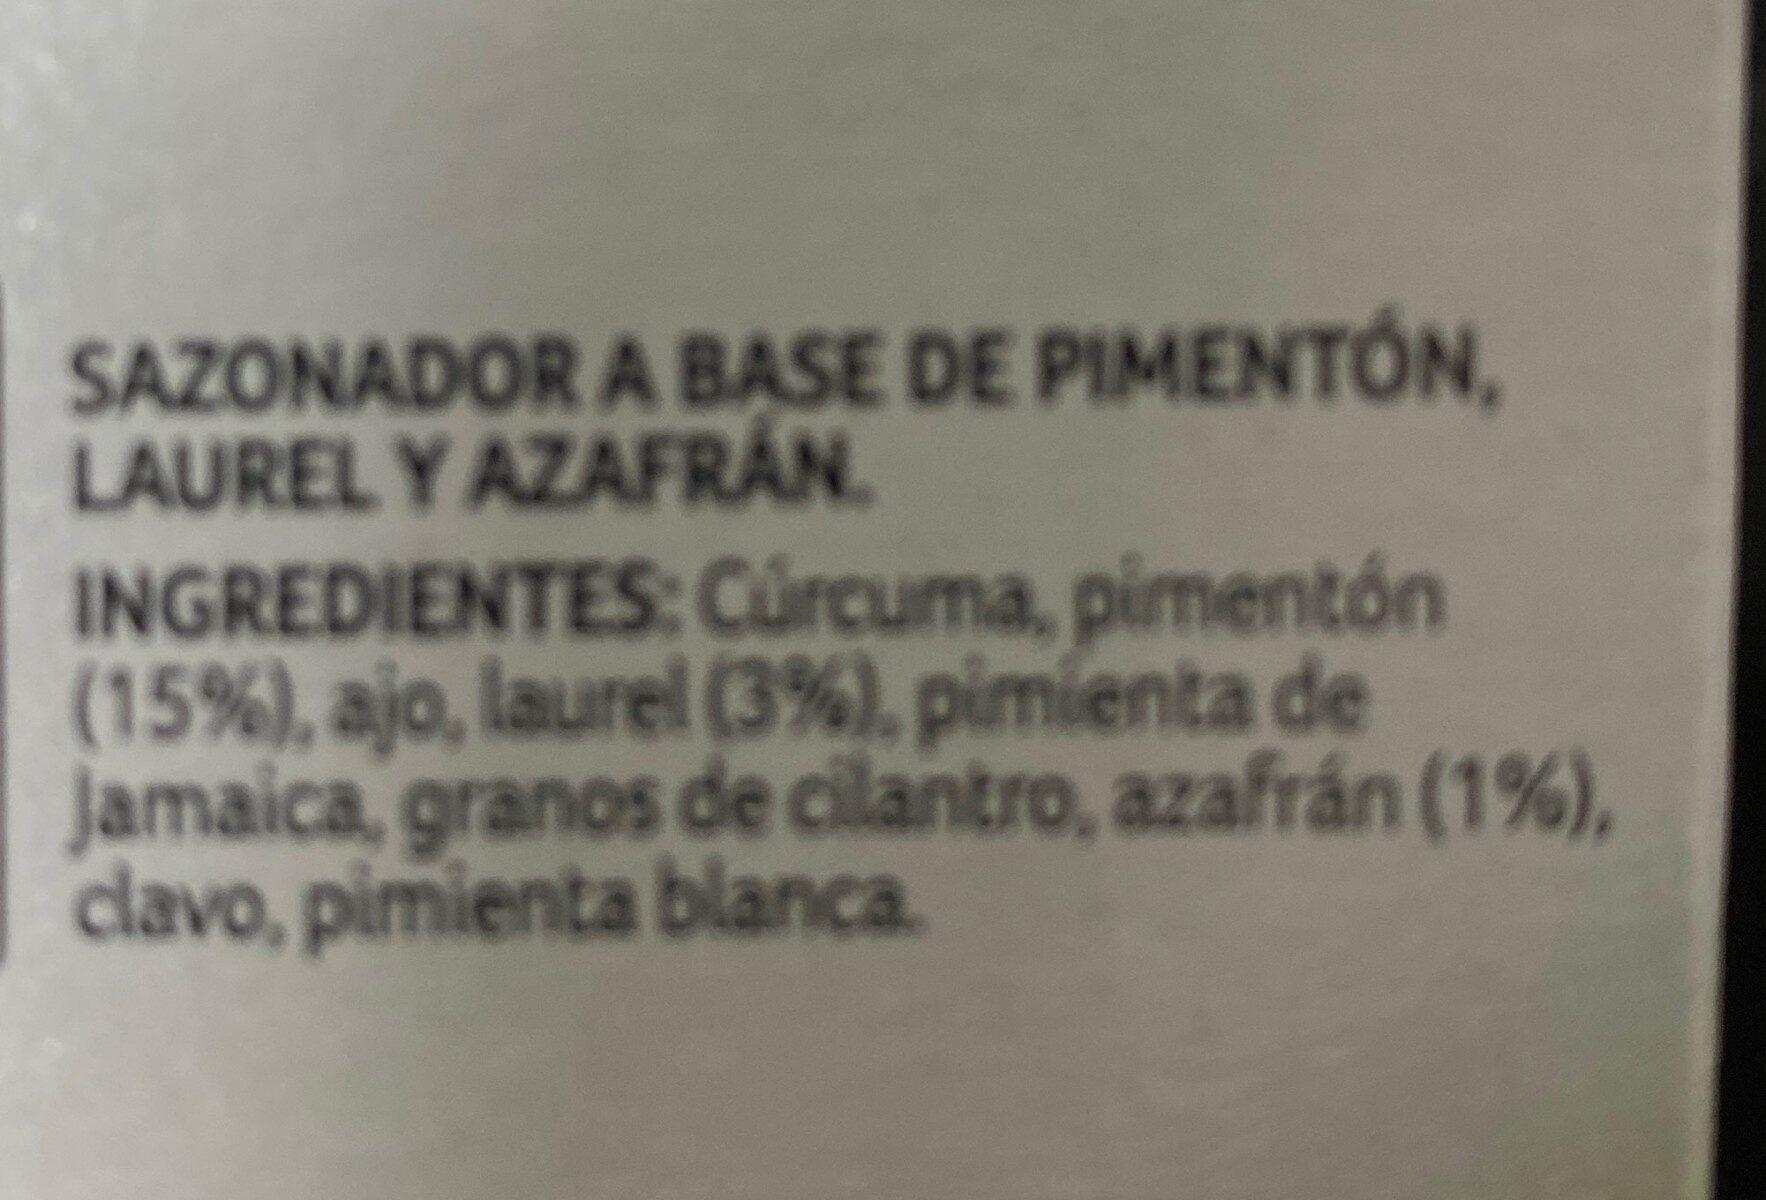 Sazonador paella valenciana - Nutrition facts - en